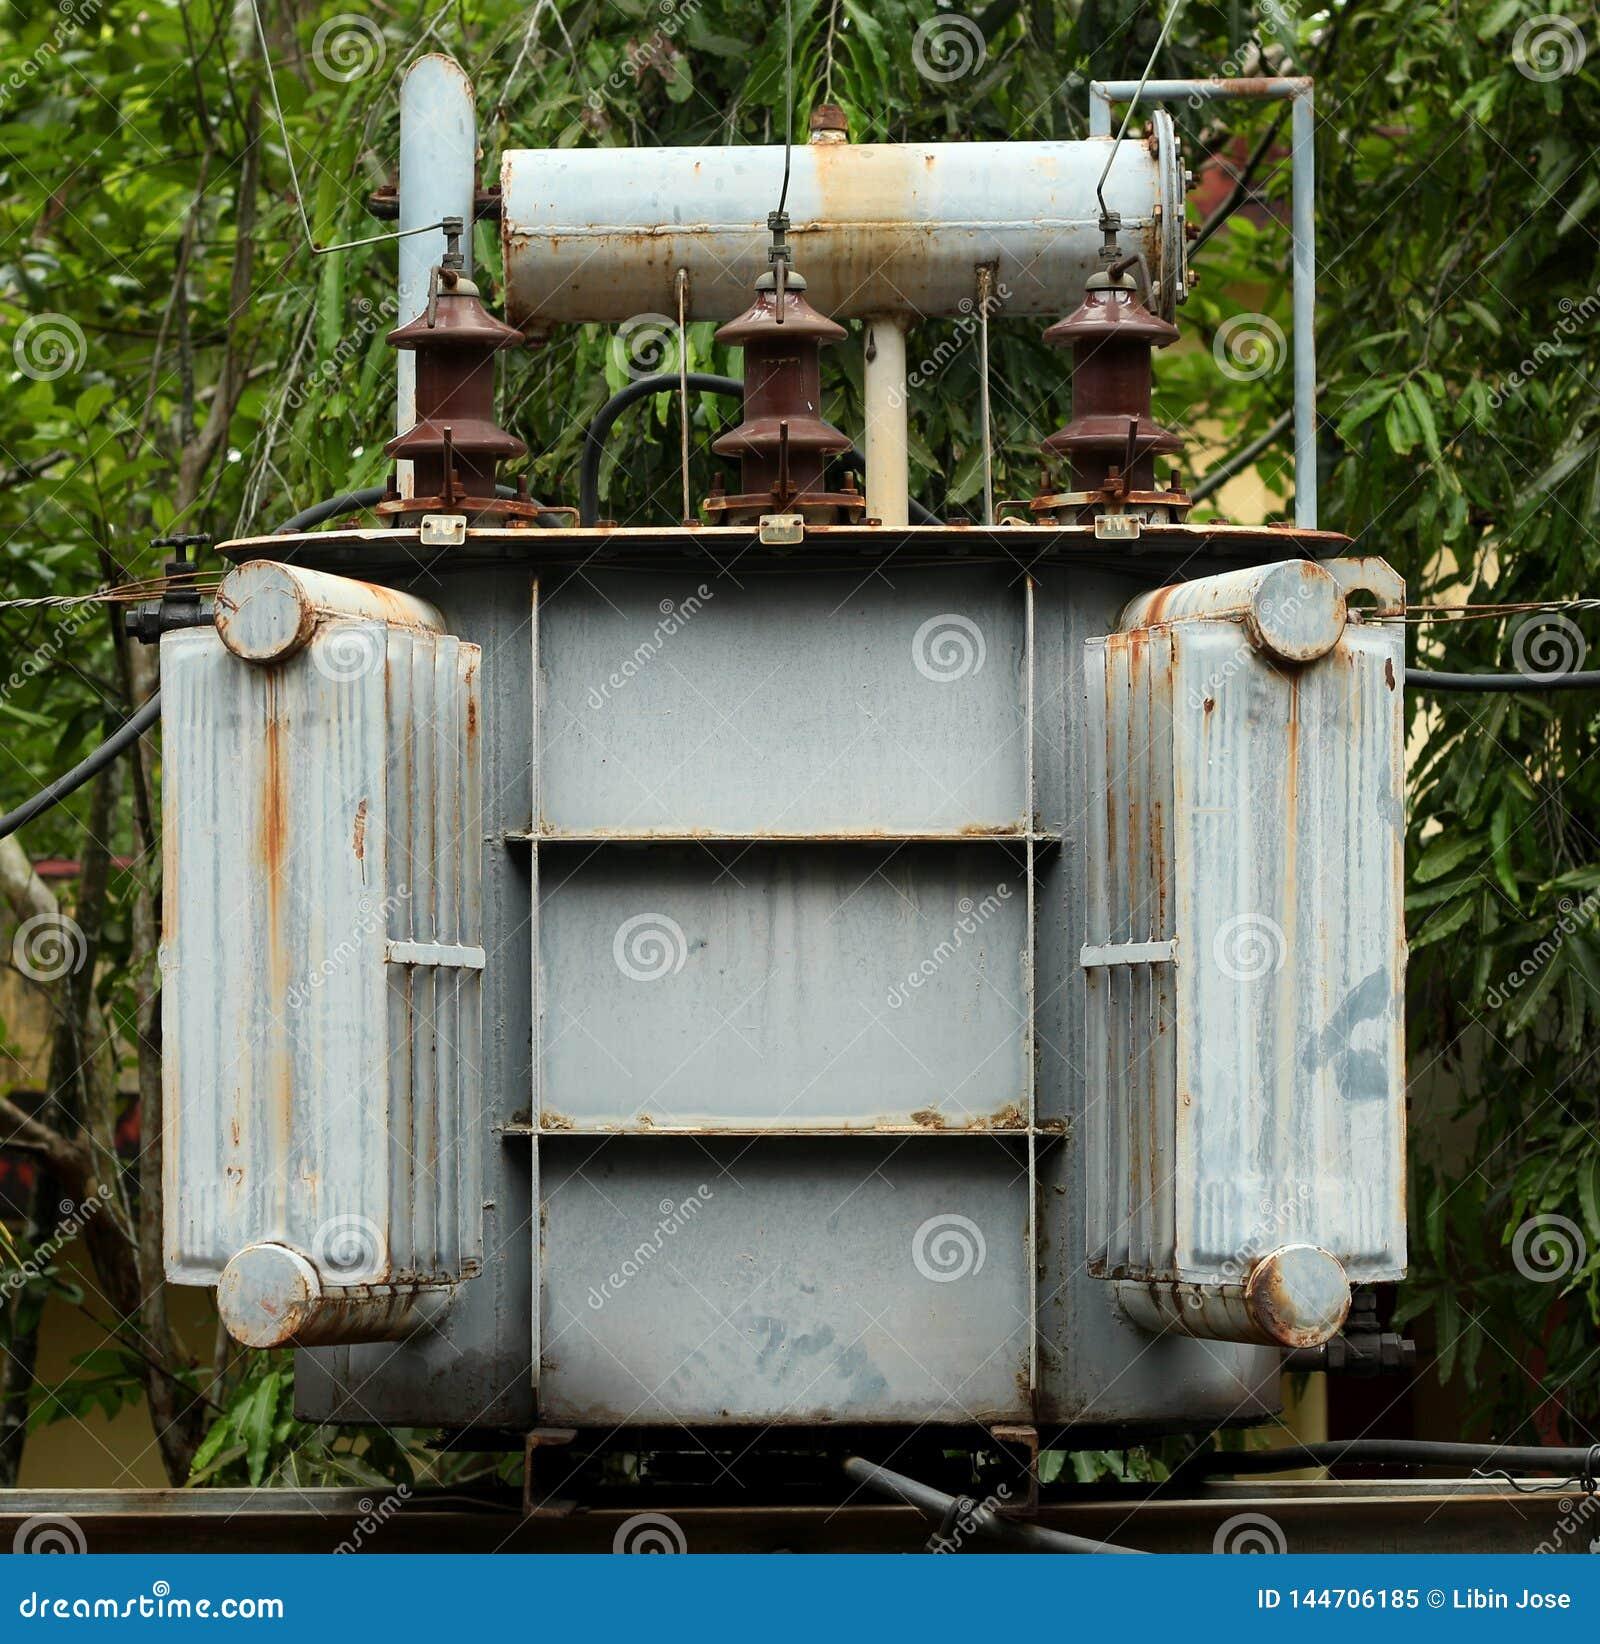 Transformator elektro in de post